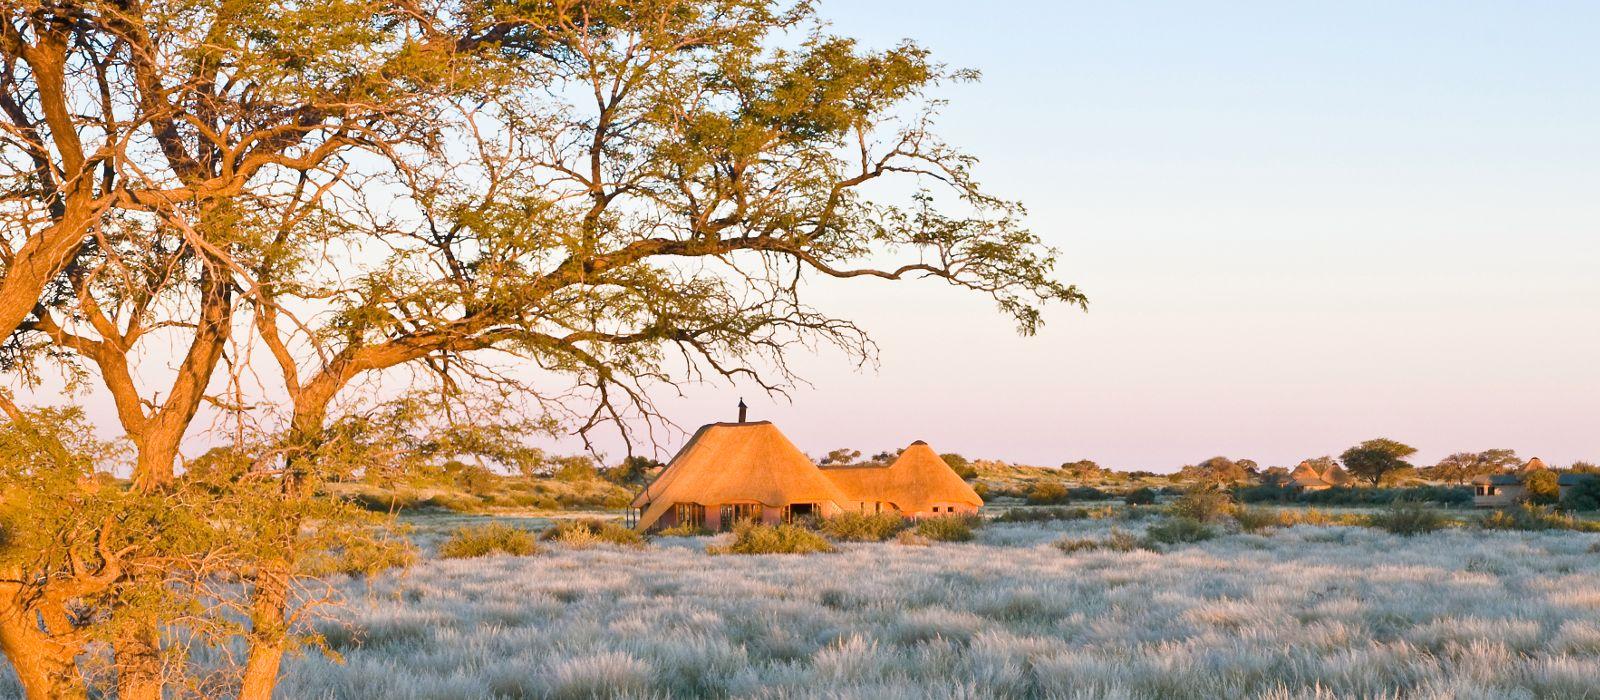 Hotel Kalahari Red Dunes Lodge South Africa